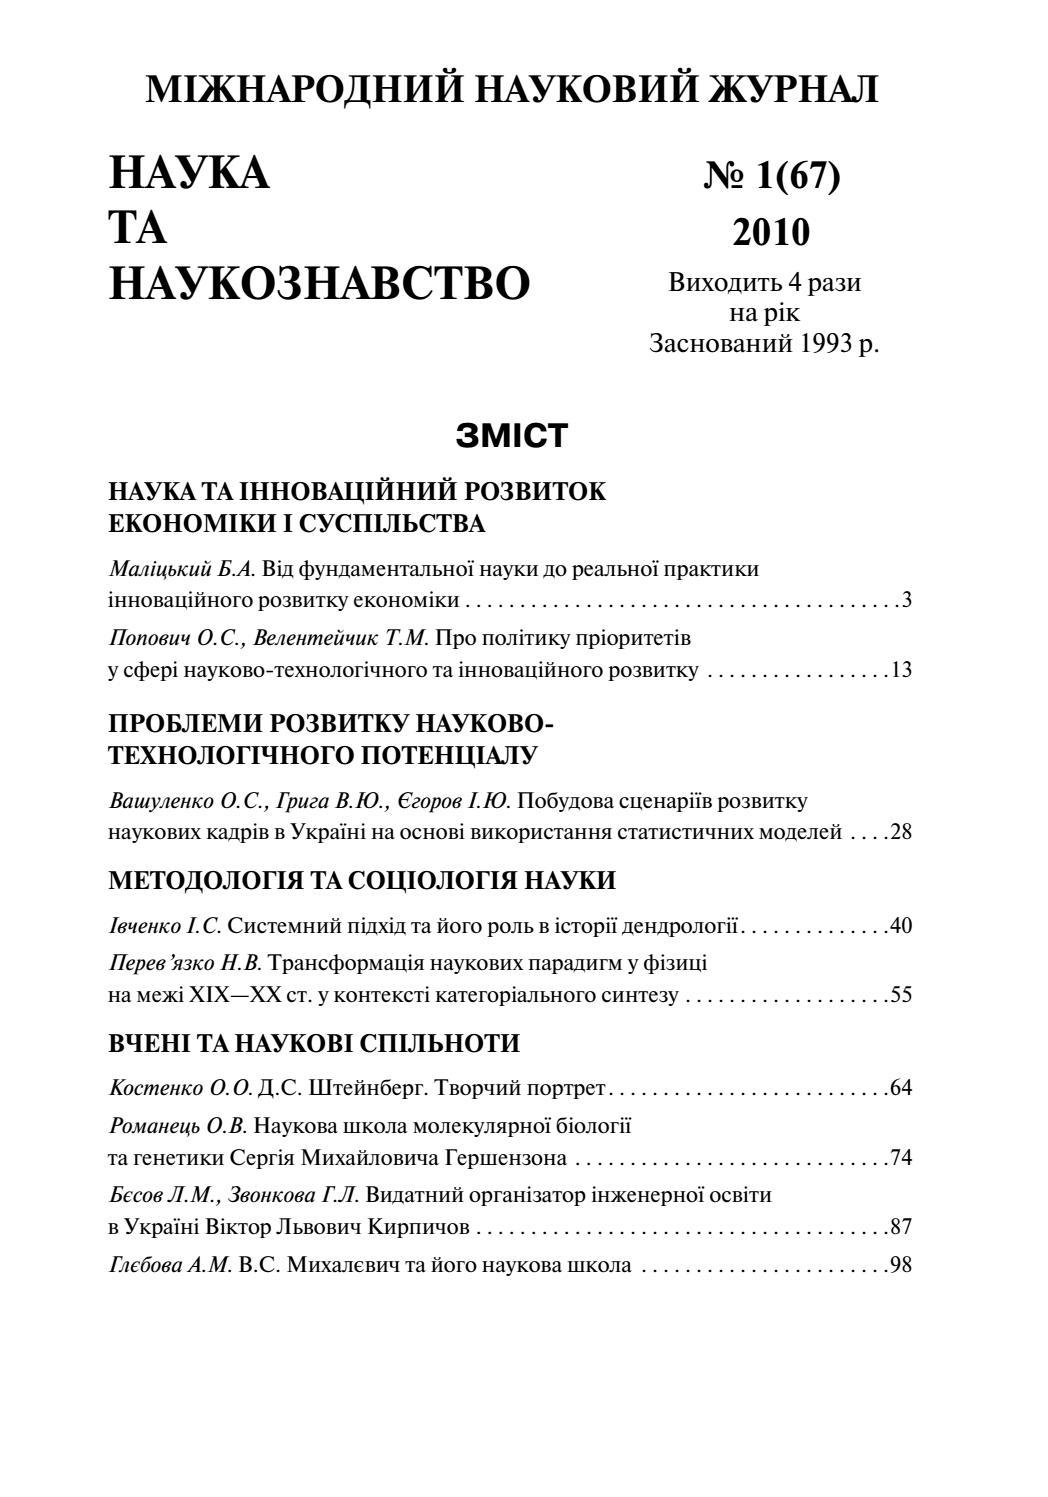 МІЖНАРОДНИЙ НАУКОВИЙ ЖУРНАЛ НАУКА ТА НАУКОЗНАВСТВО № 1(67) by Alex Udovenko  - issuu 2e17d1c3e3863